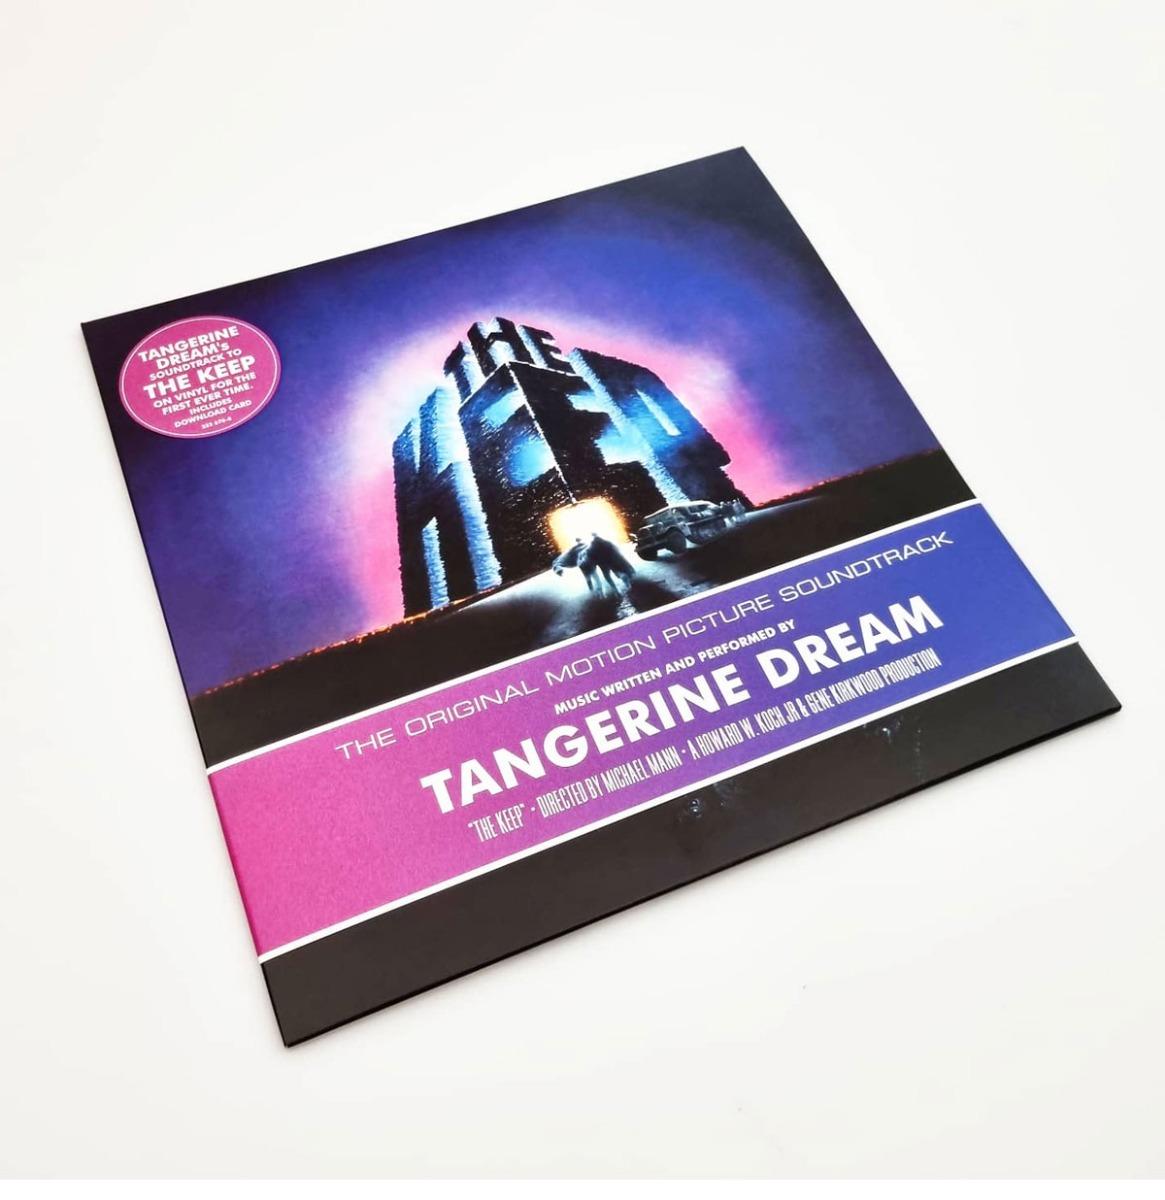 Soundtrack - The Keep - Tangerine Dream Lp - RSD 2021